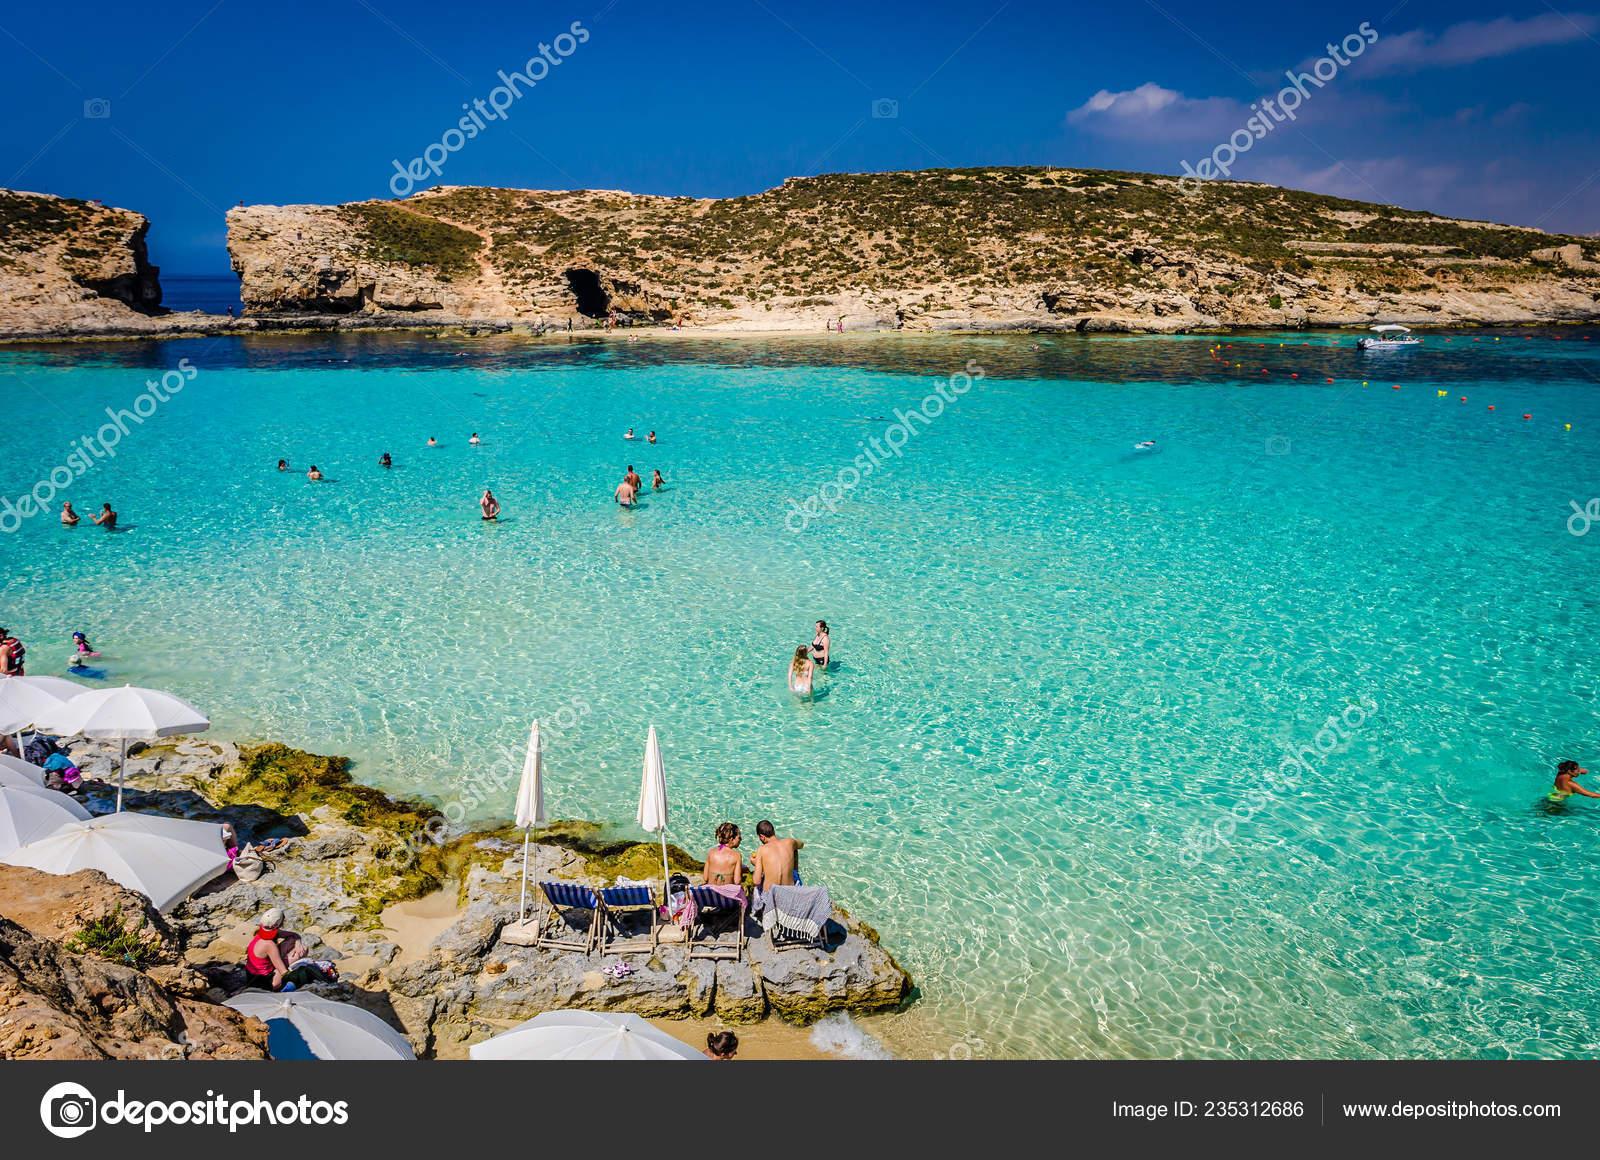 Blue Lagoon Malta Caves Blue Lagoon Island Comino Bright